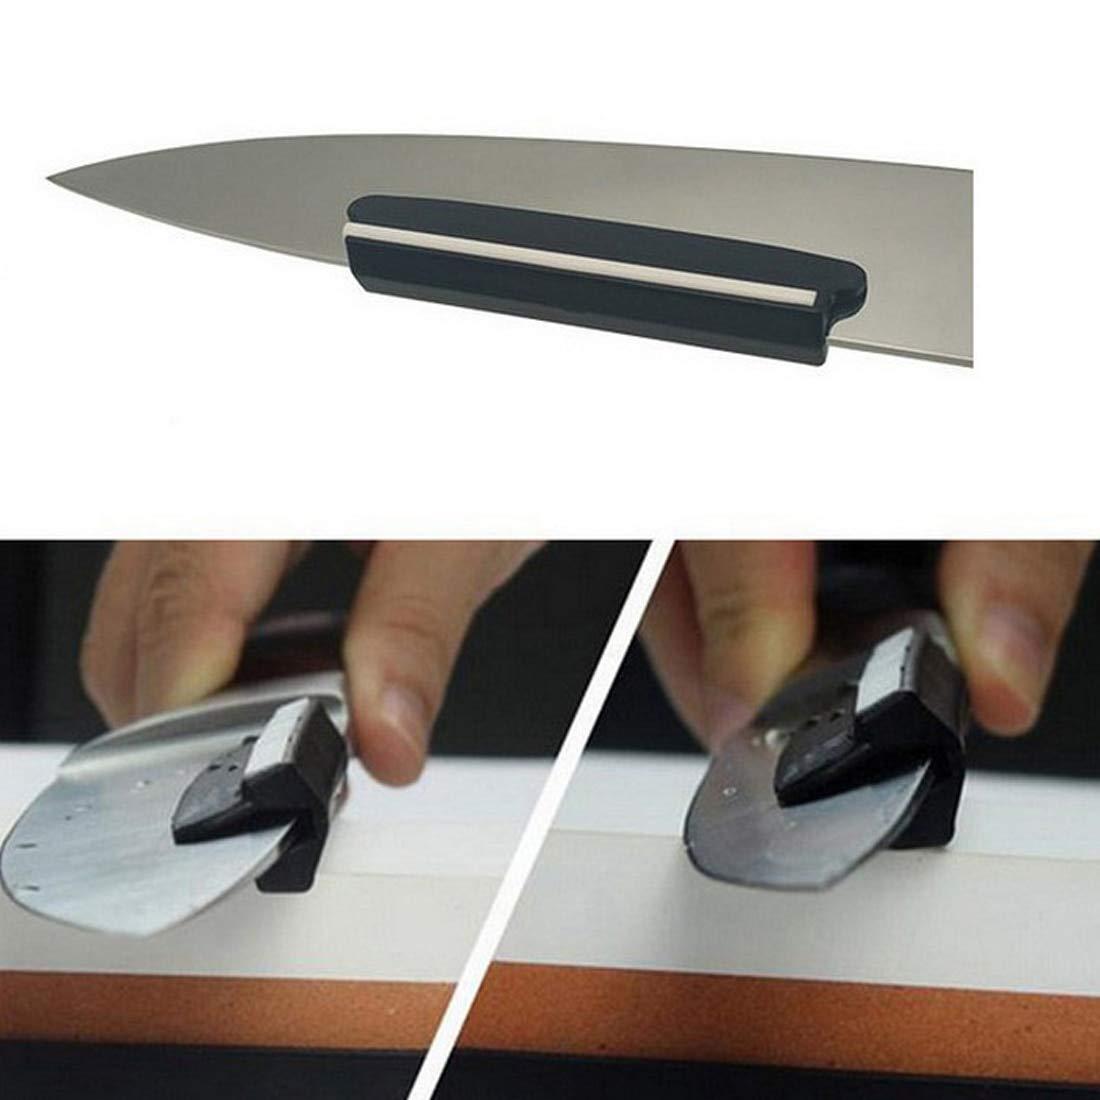 VHLL Sharpener Fixed Angle Grinding Clamp for Whetstone Sharpening Guide Tool Knife Sharpener Sharpening Stone